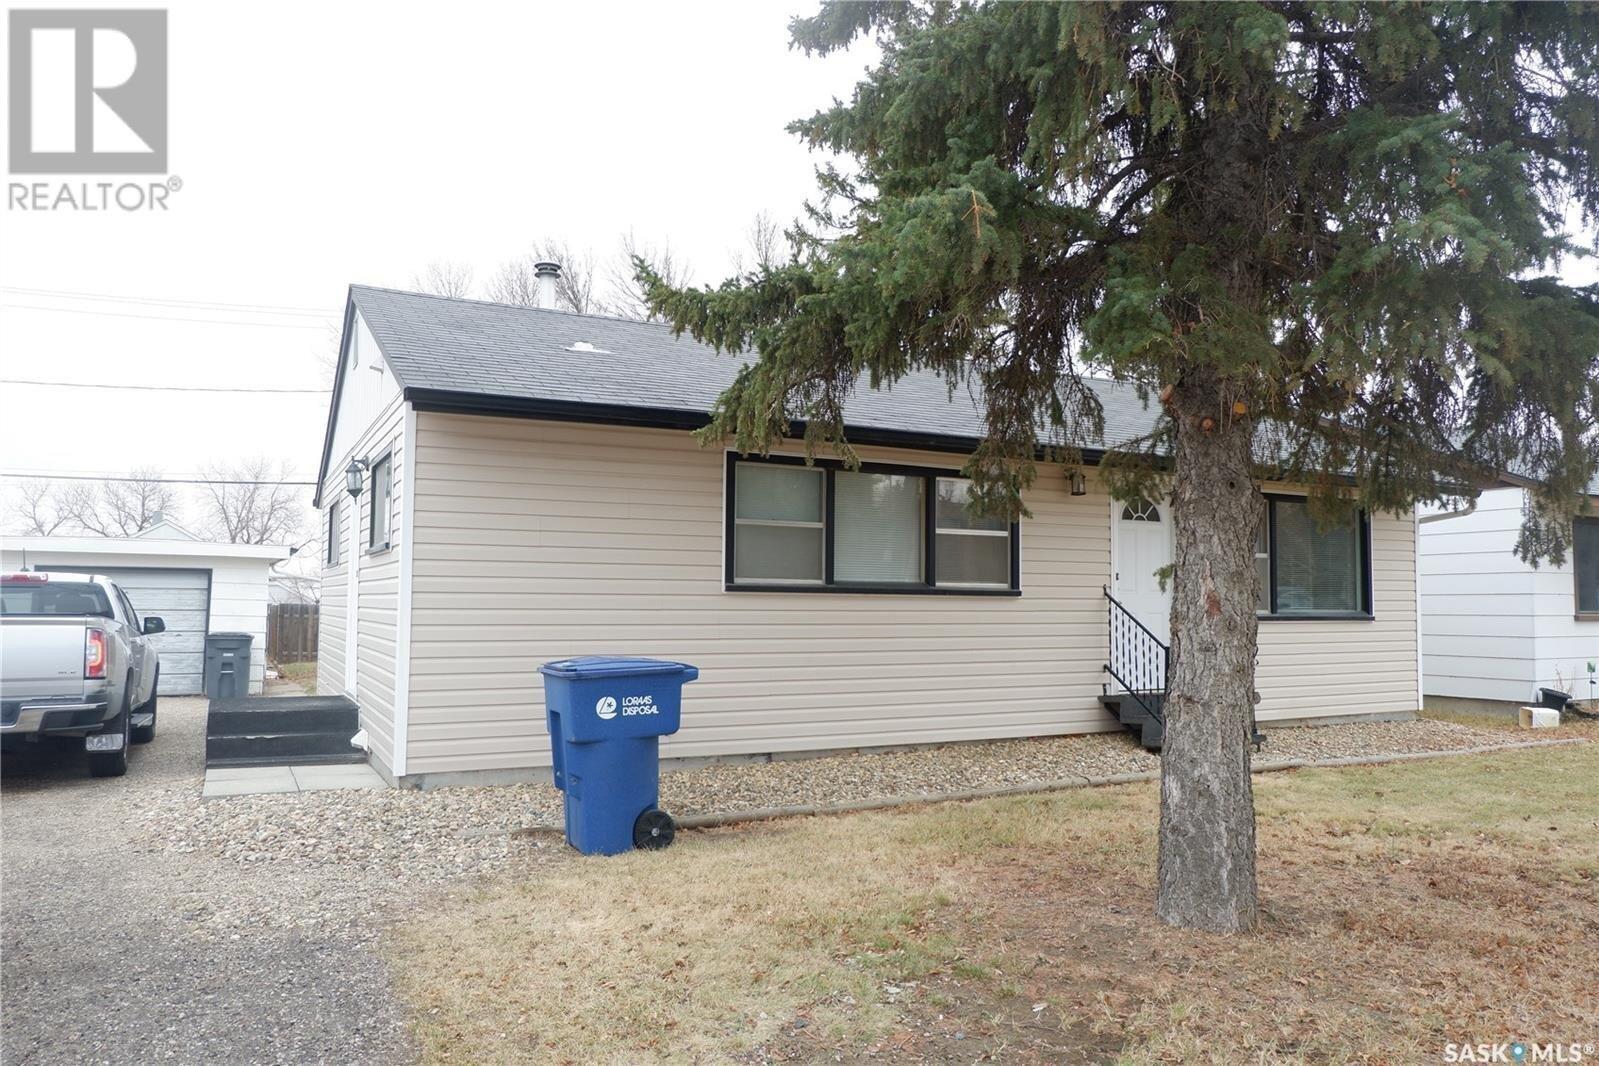 House for sale at 507 2nd Ave E Assiniboia Saskatchewan - MLS: SK833242